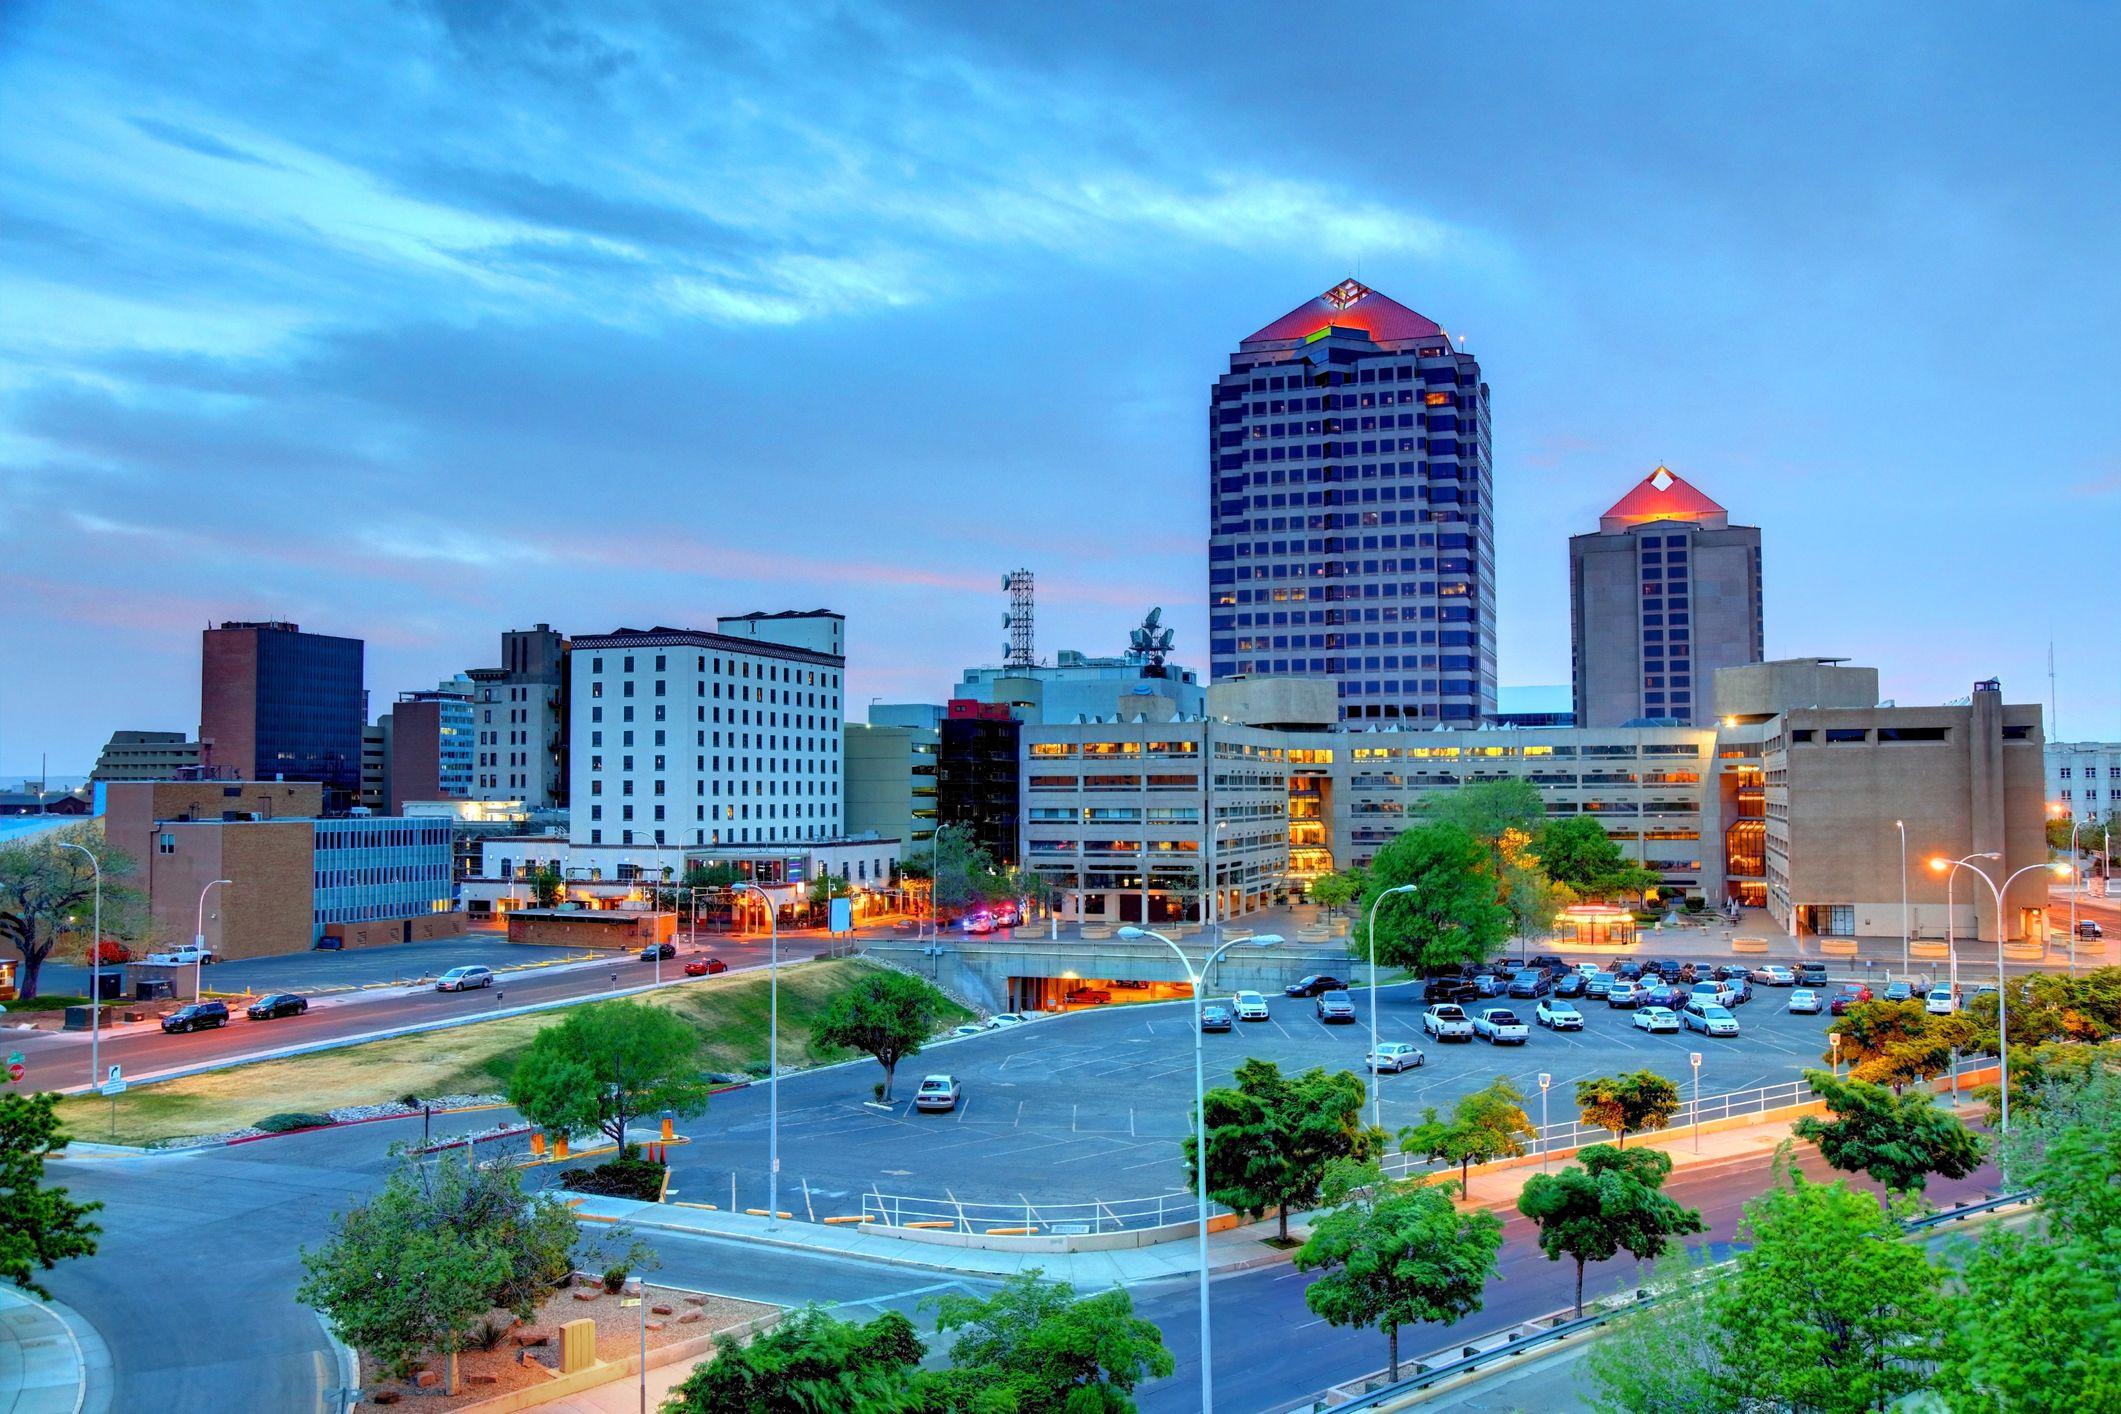 Albuquerque, NM | Cities for Financial Empowerment Fund